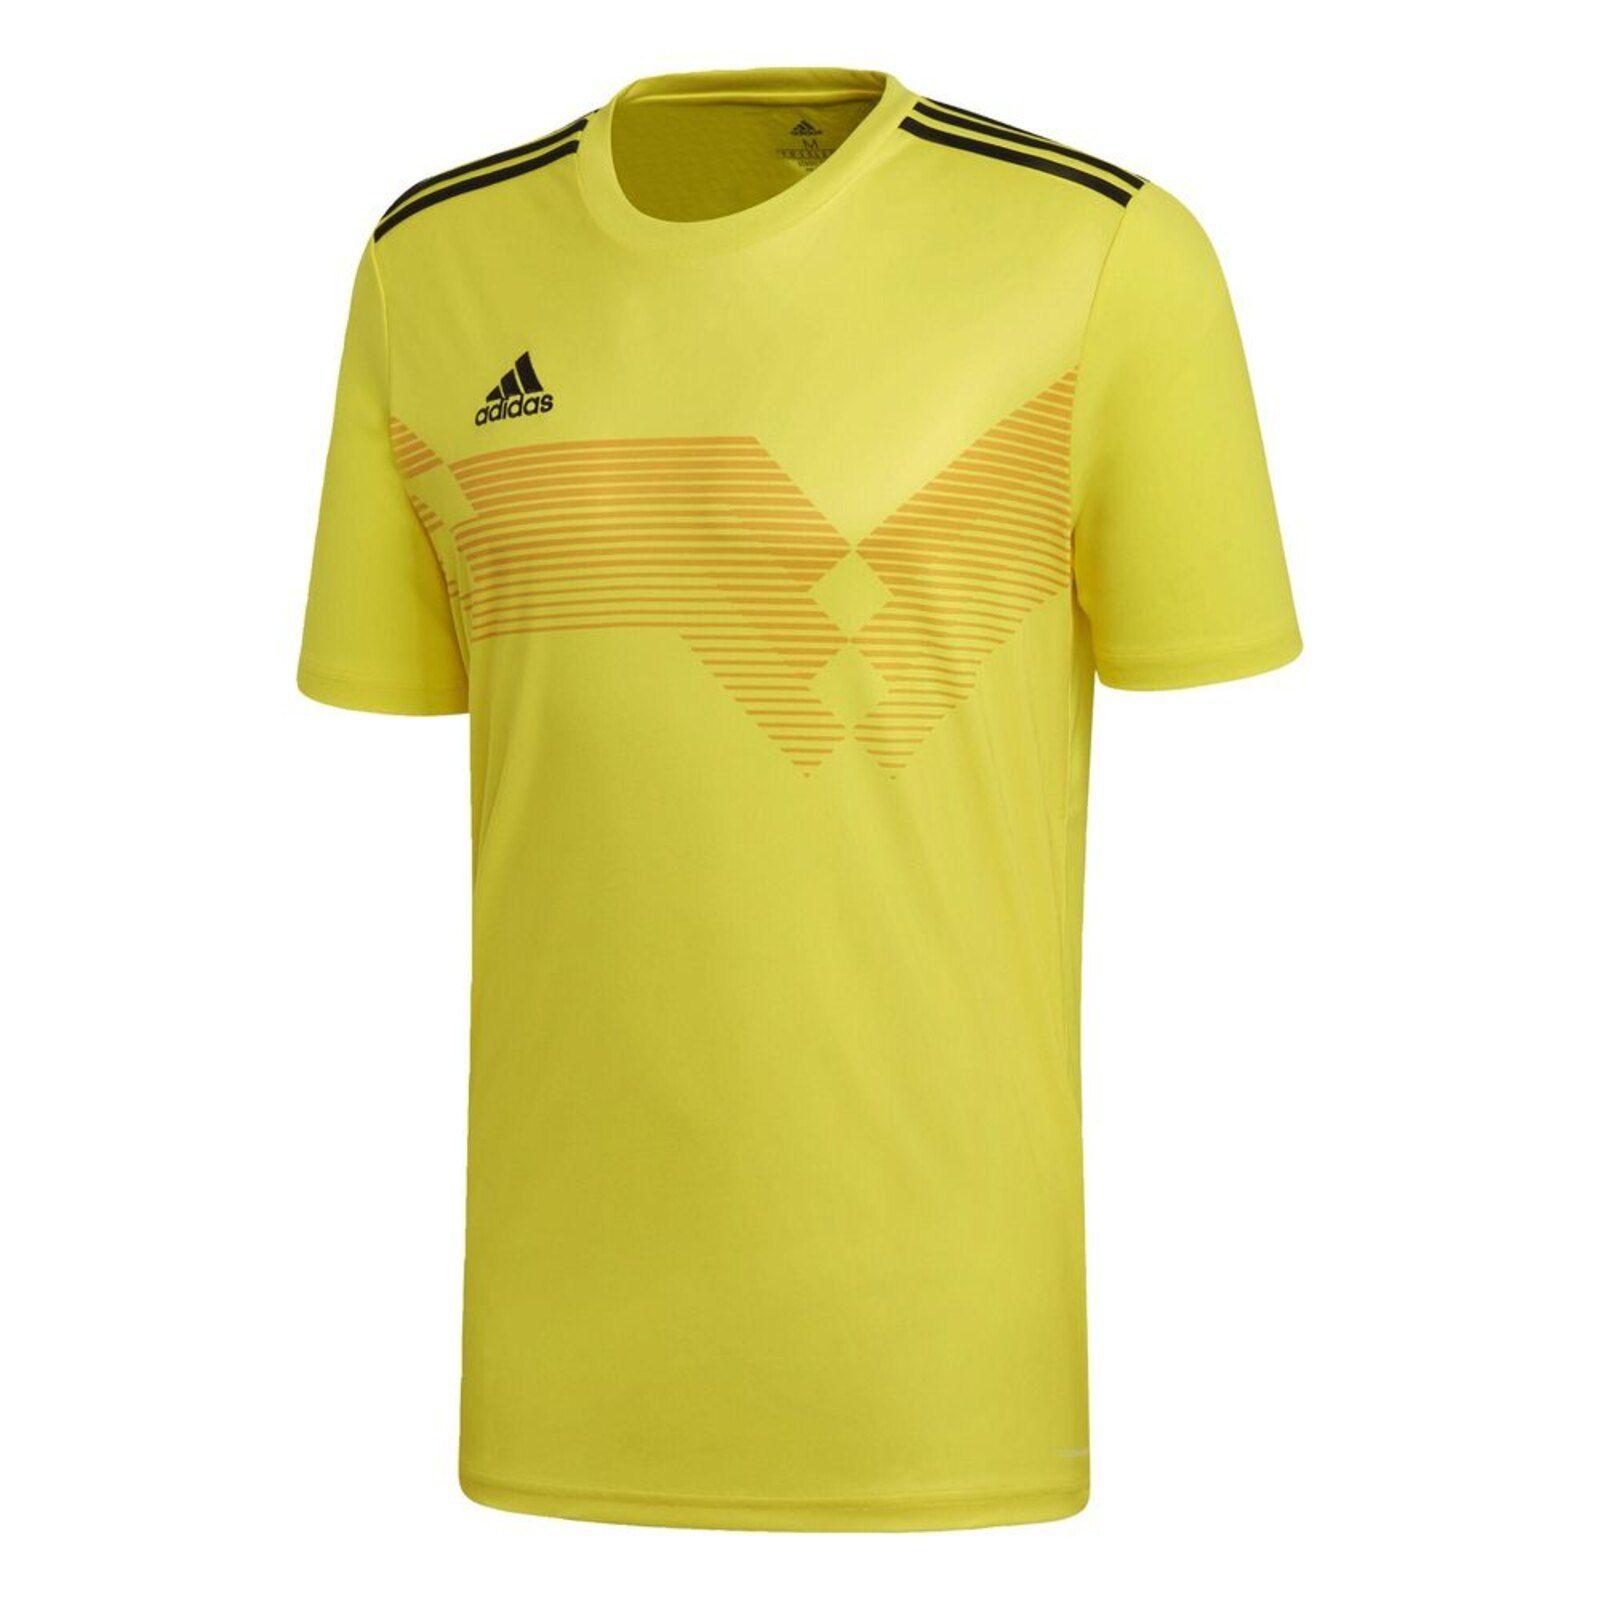 Sinis Quizás Montañas climáticas  Camiseta Adidas CAMPEON19 Amarelo   Camisas de futebol, Adidas e ...